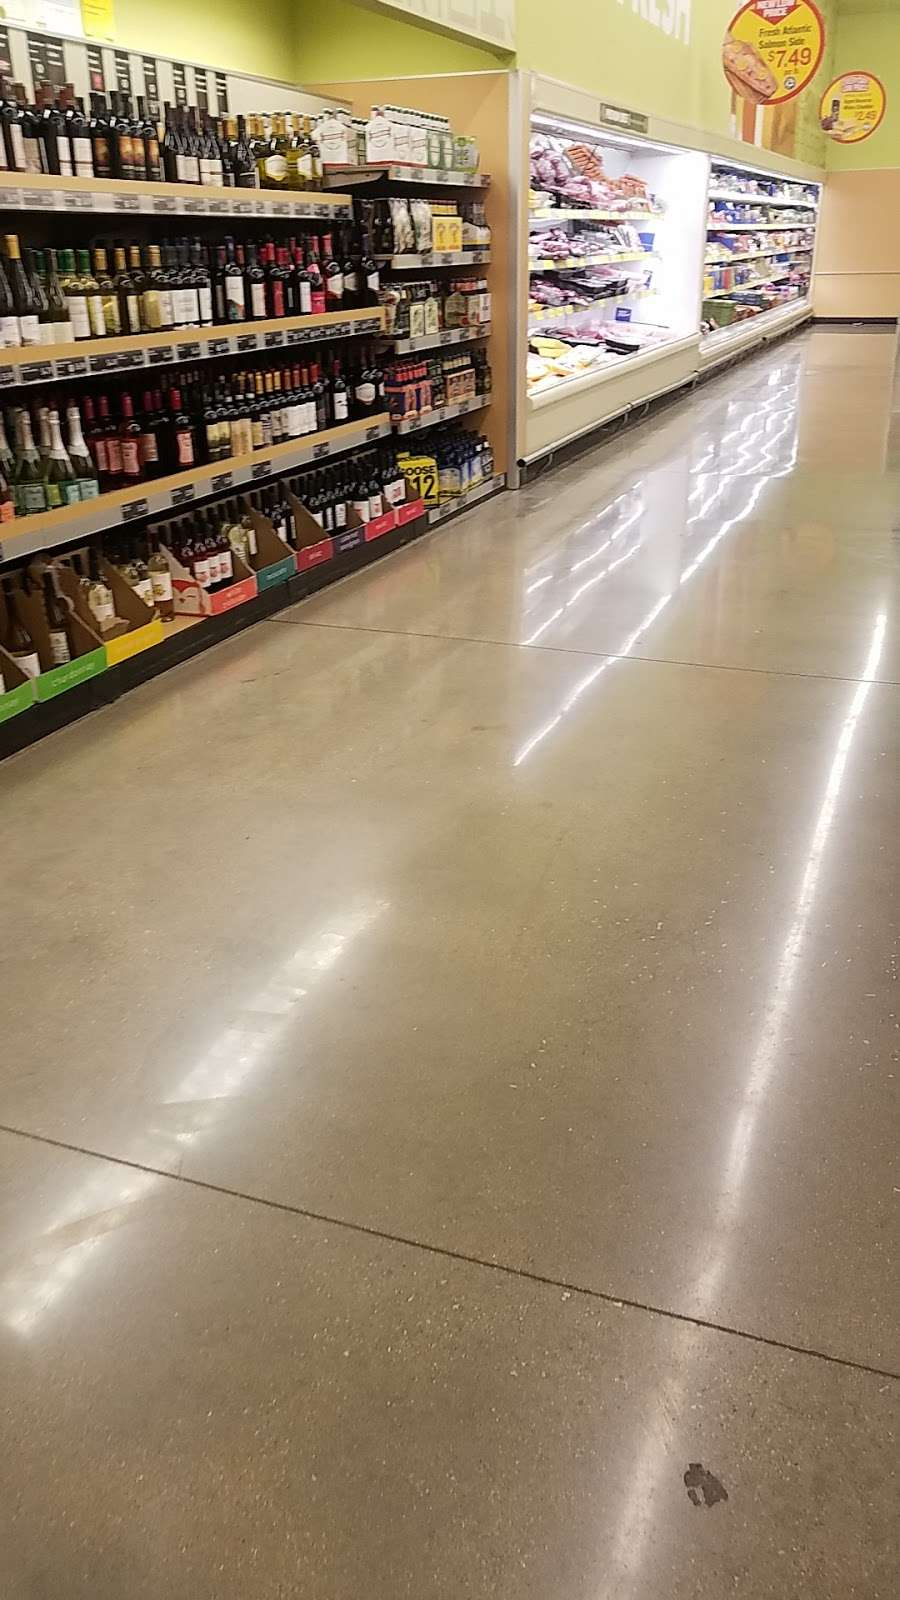 ALDI - supermarket  | Photo 10 of 10 | Address: 1038 N Rohlwing Rd, Addison, IL 60101, USA | Phone: (855) 955-2534